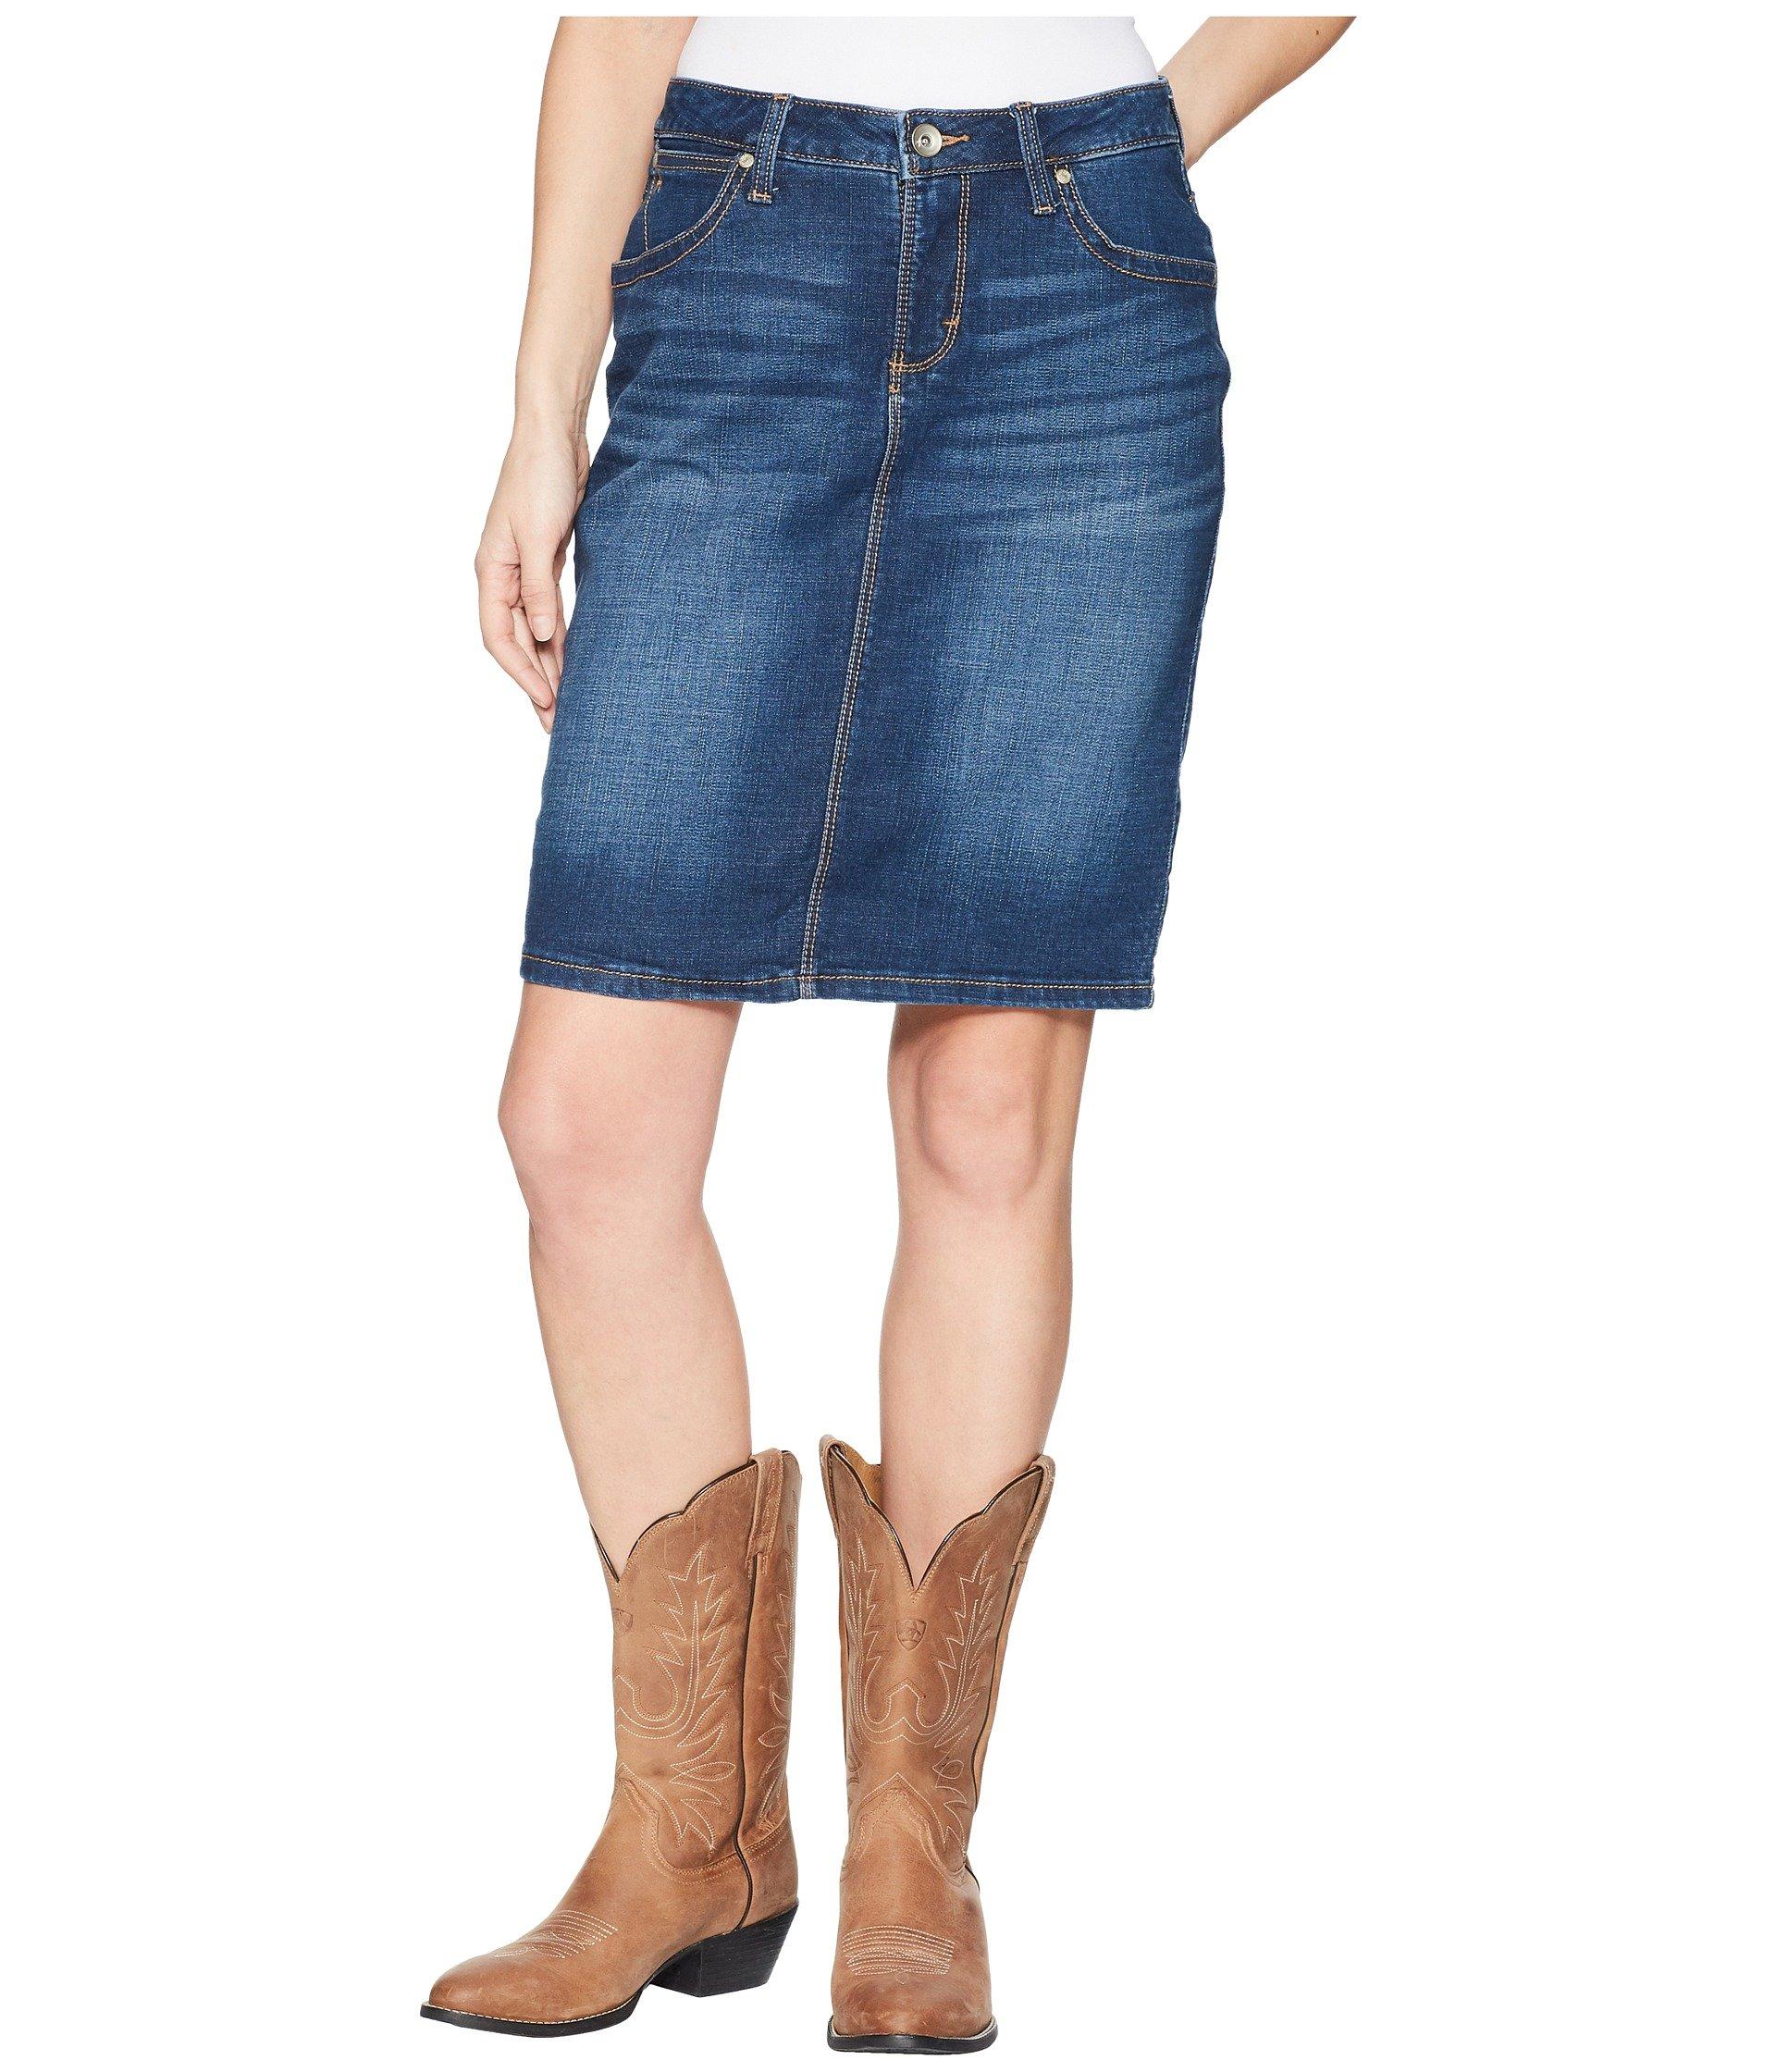 Falda para Mujer Wrangler Western Aura Skirt  + Wrangler en VeoyCompro.net